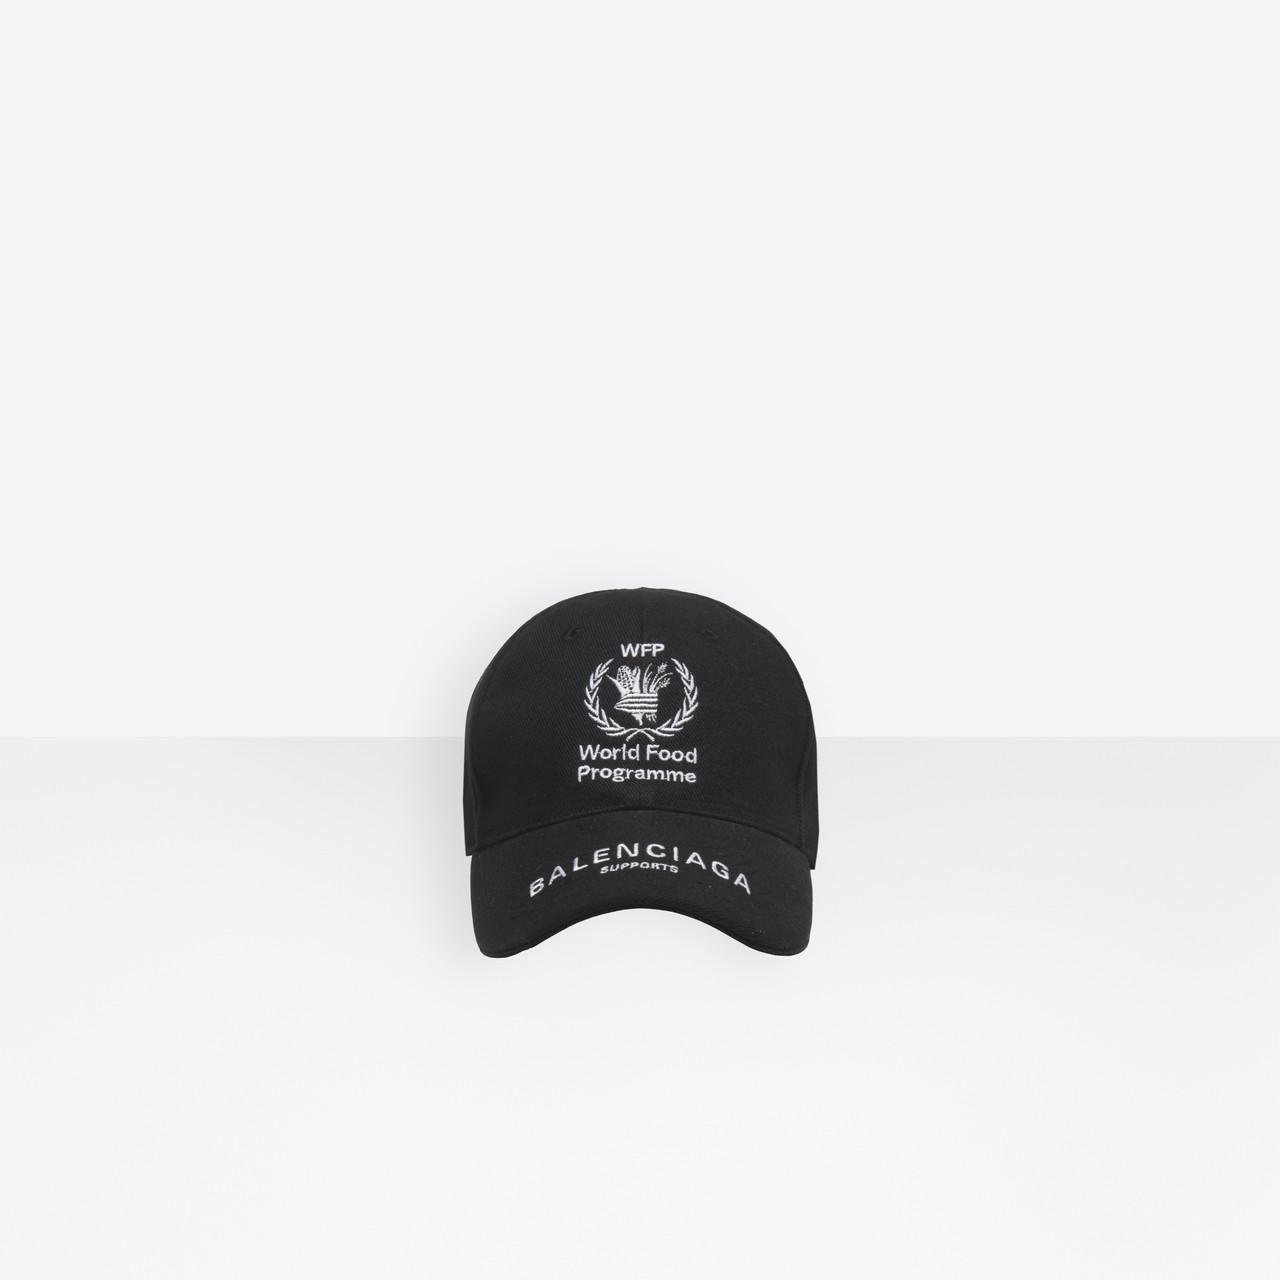 3d700da6 Balenciaga World Food Programme Cap in Black - Lyst